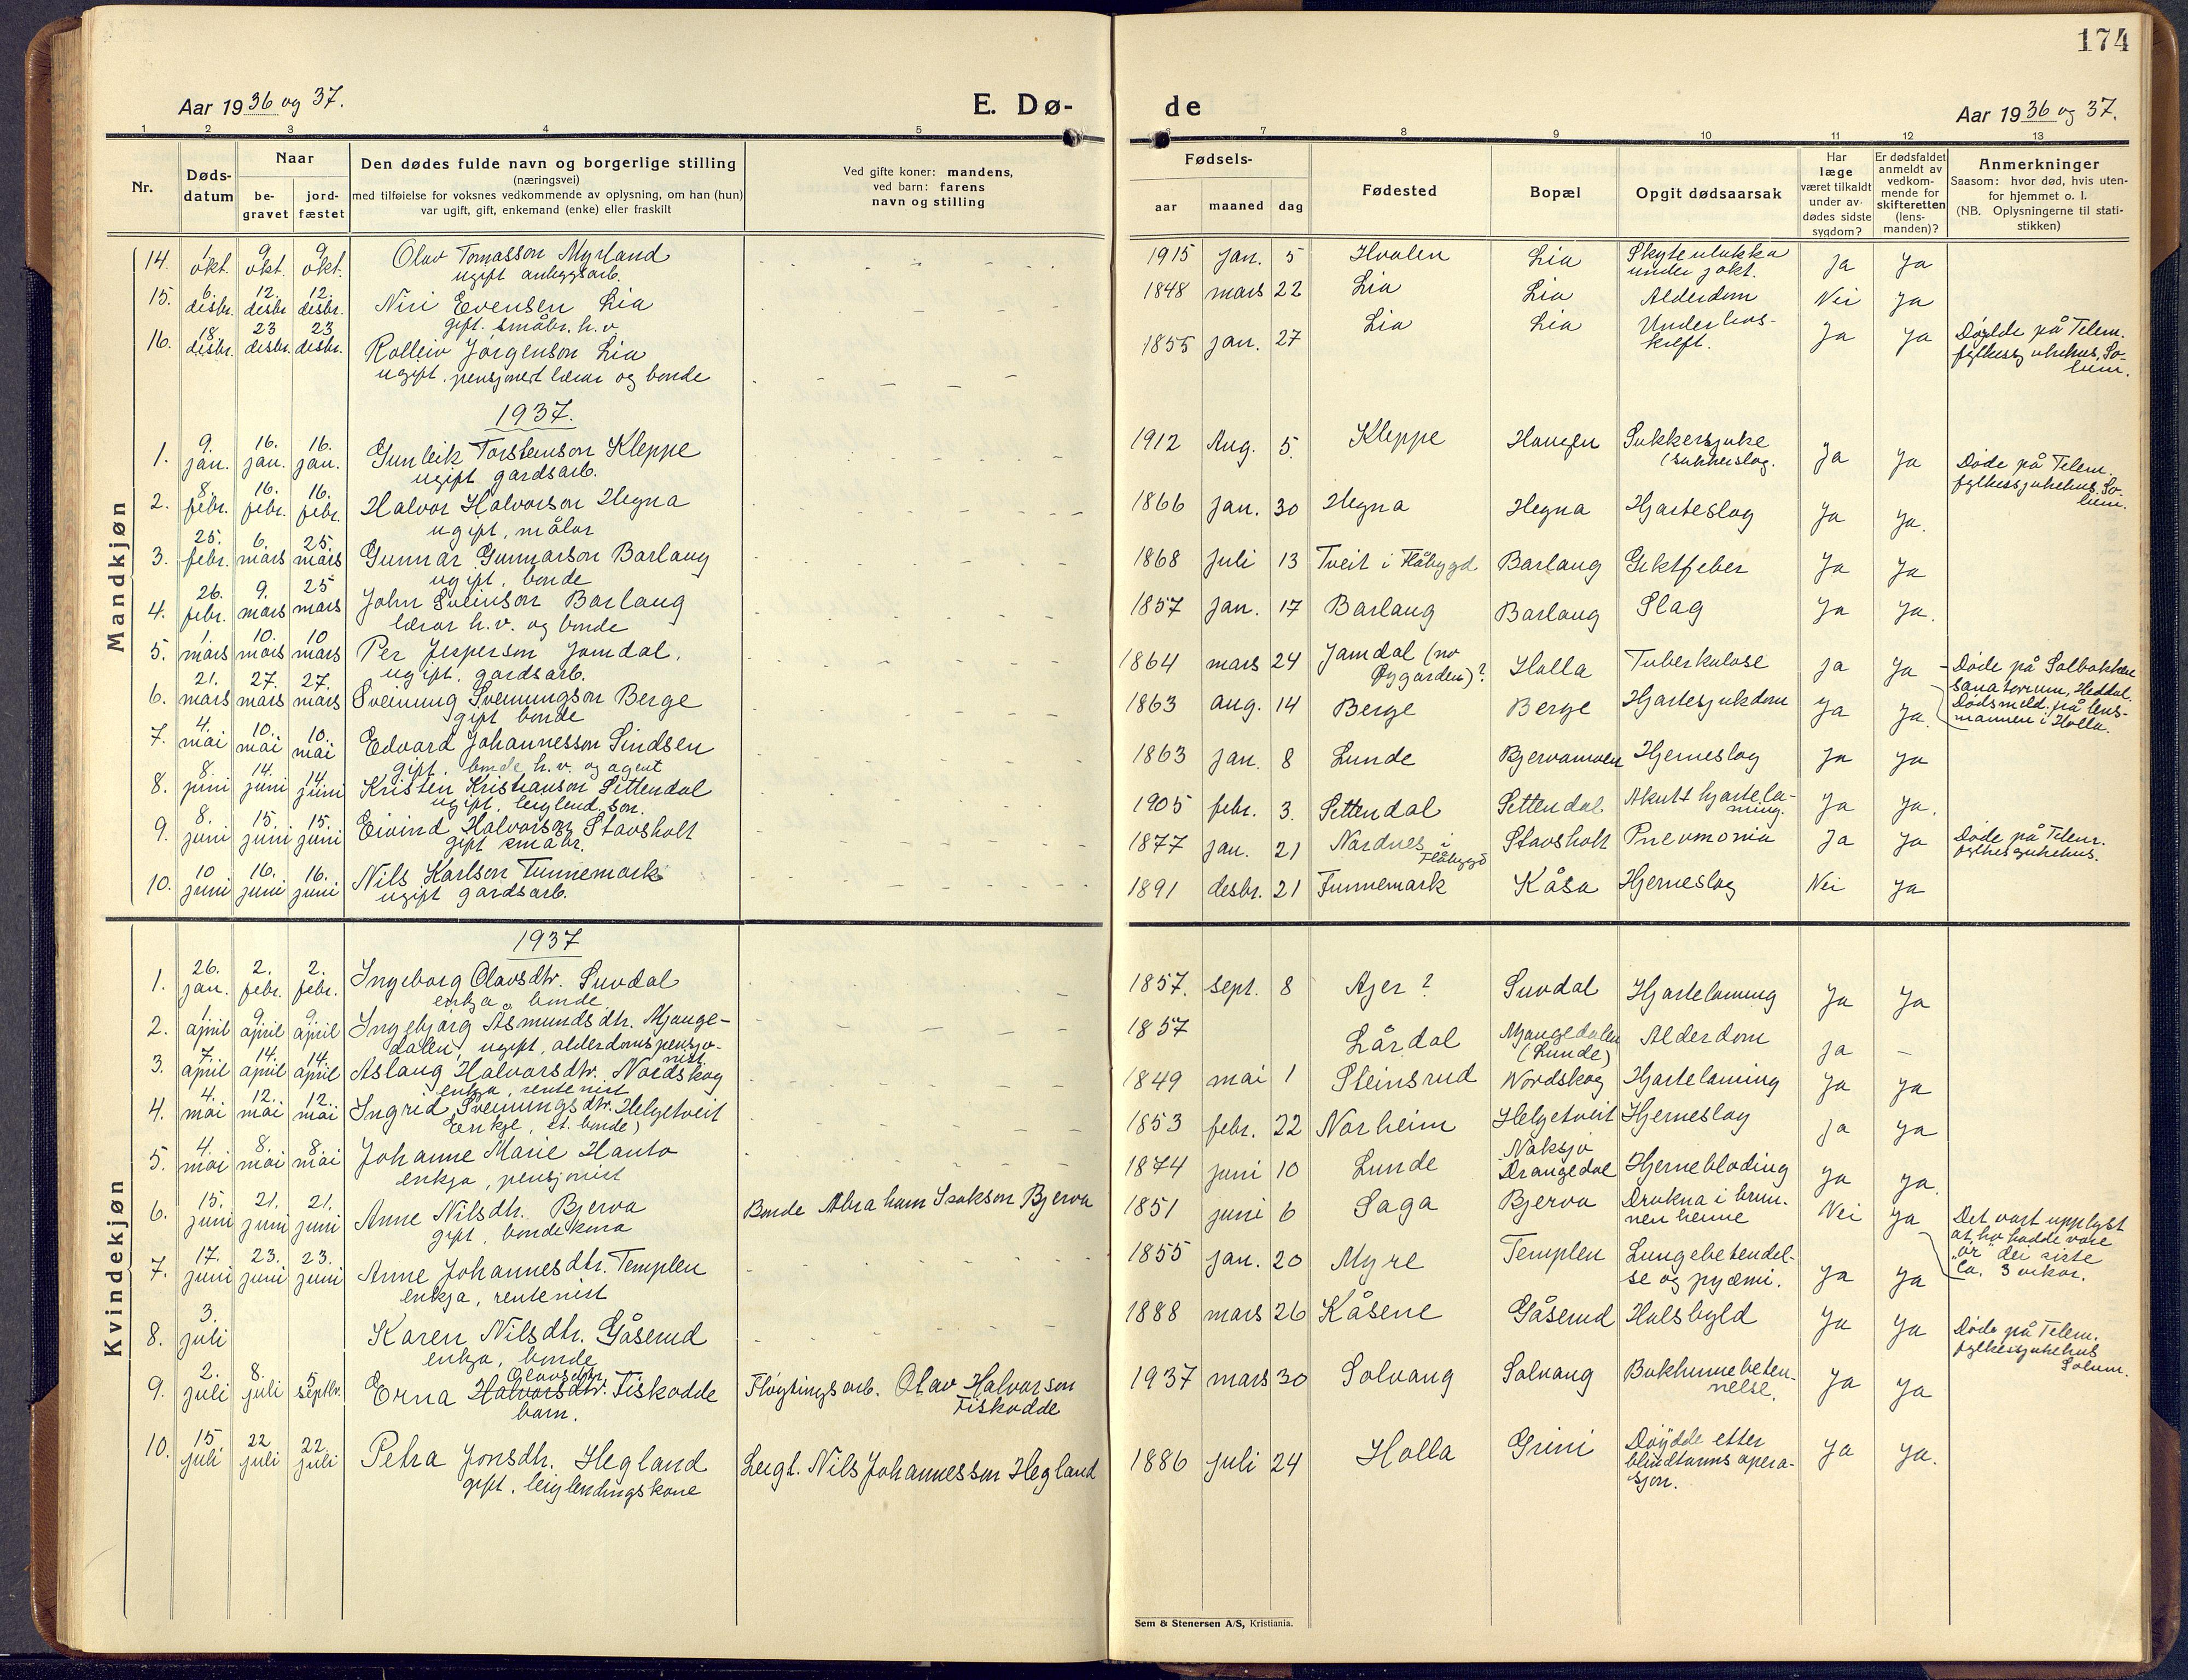 SAKO, Lunde kirkebøker, F/Fa/L0006: Ministerialbok nr. I 6, 1922-1940, s. 174